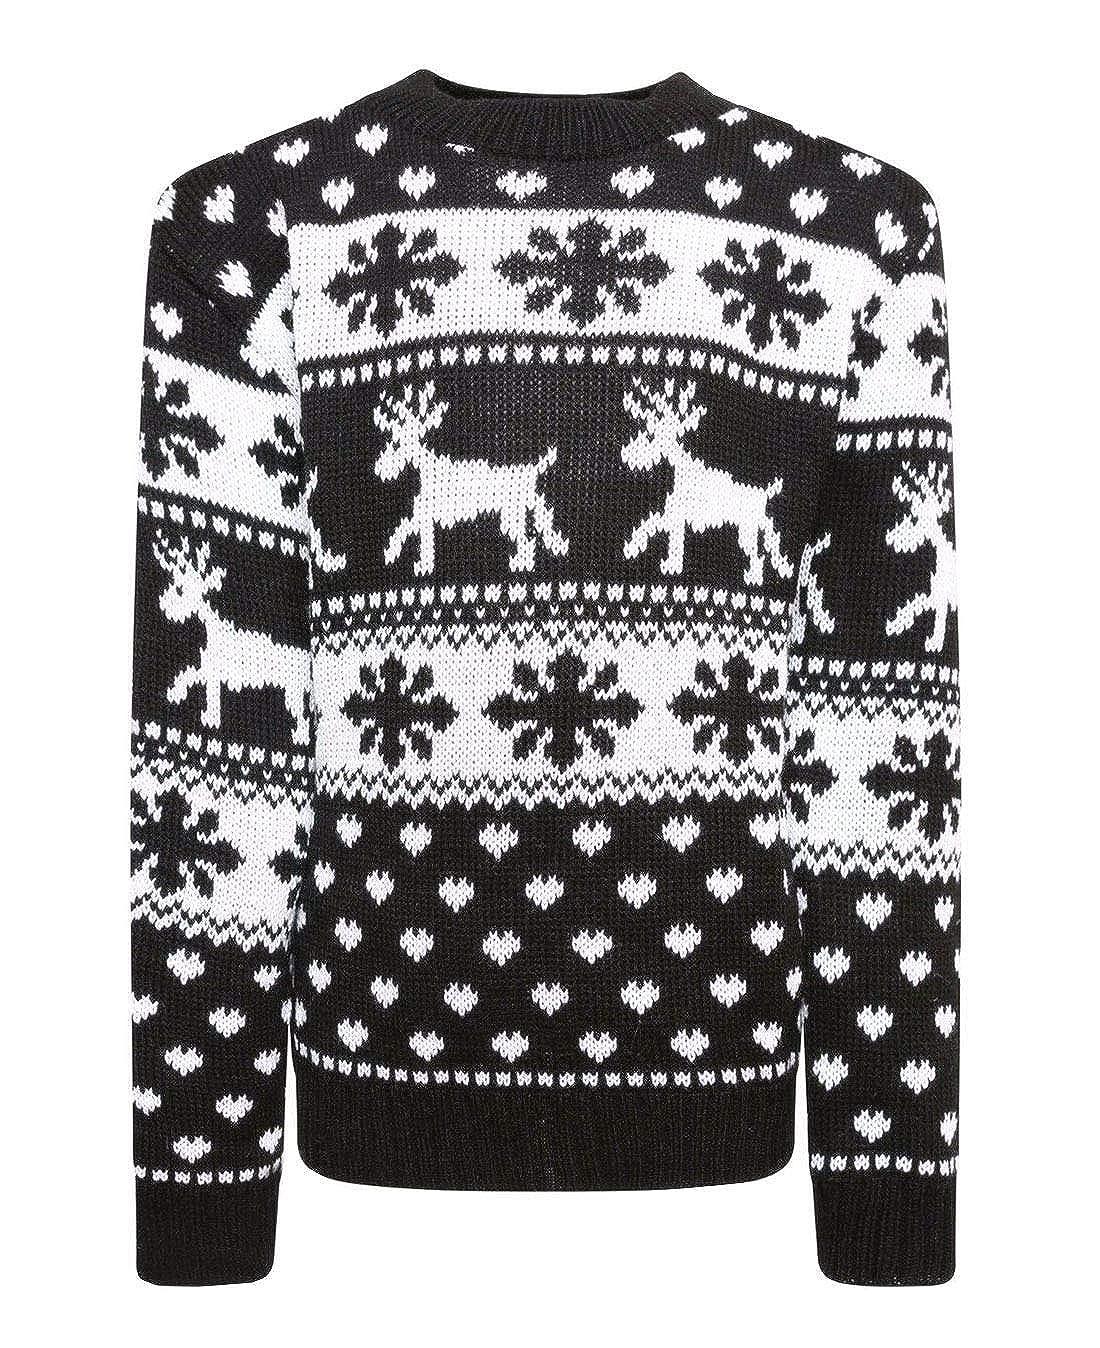 Children Kids Fancy Christmas Novelty Boys Girls Dress Party Rudolf Knitted Jumper 5-12 Years